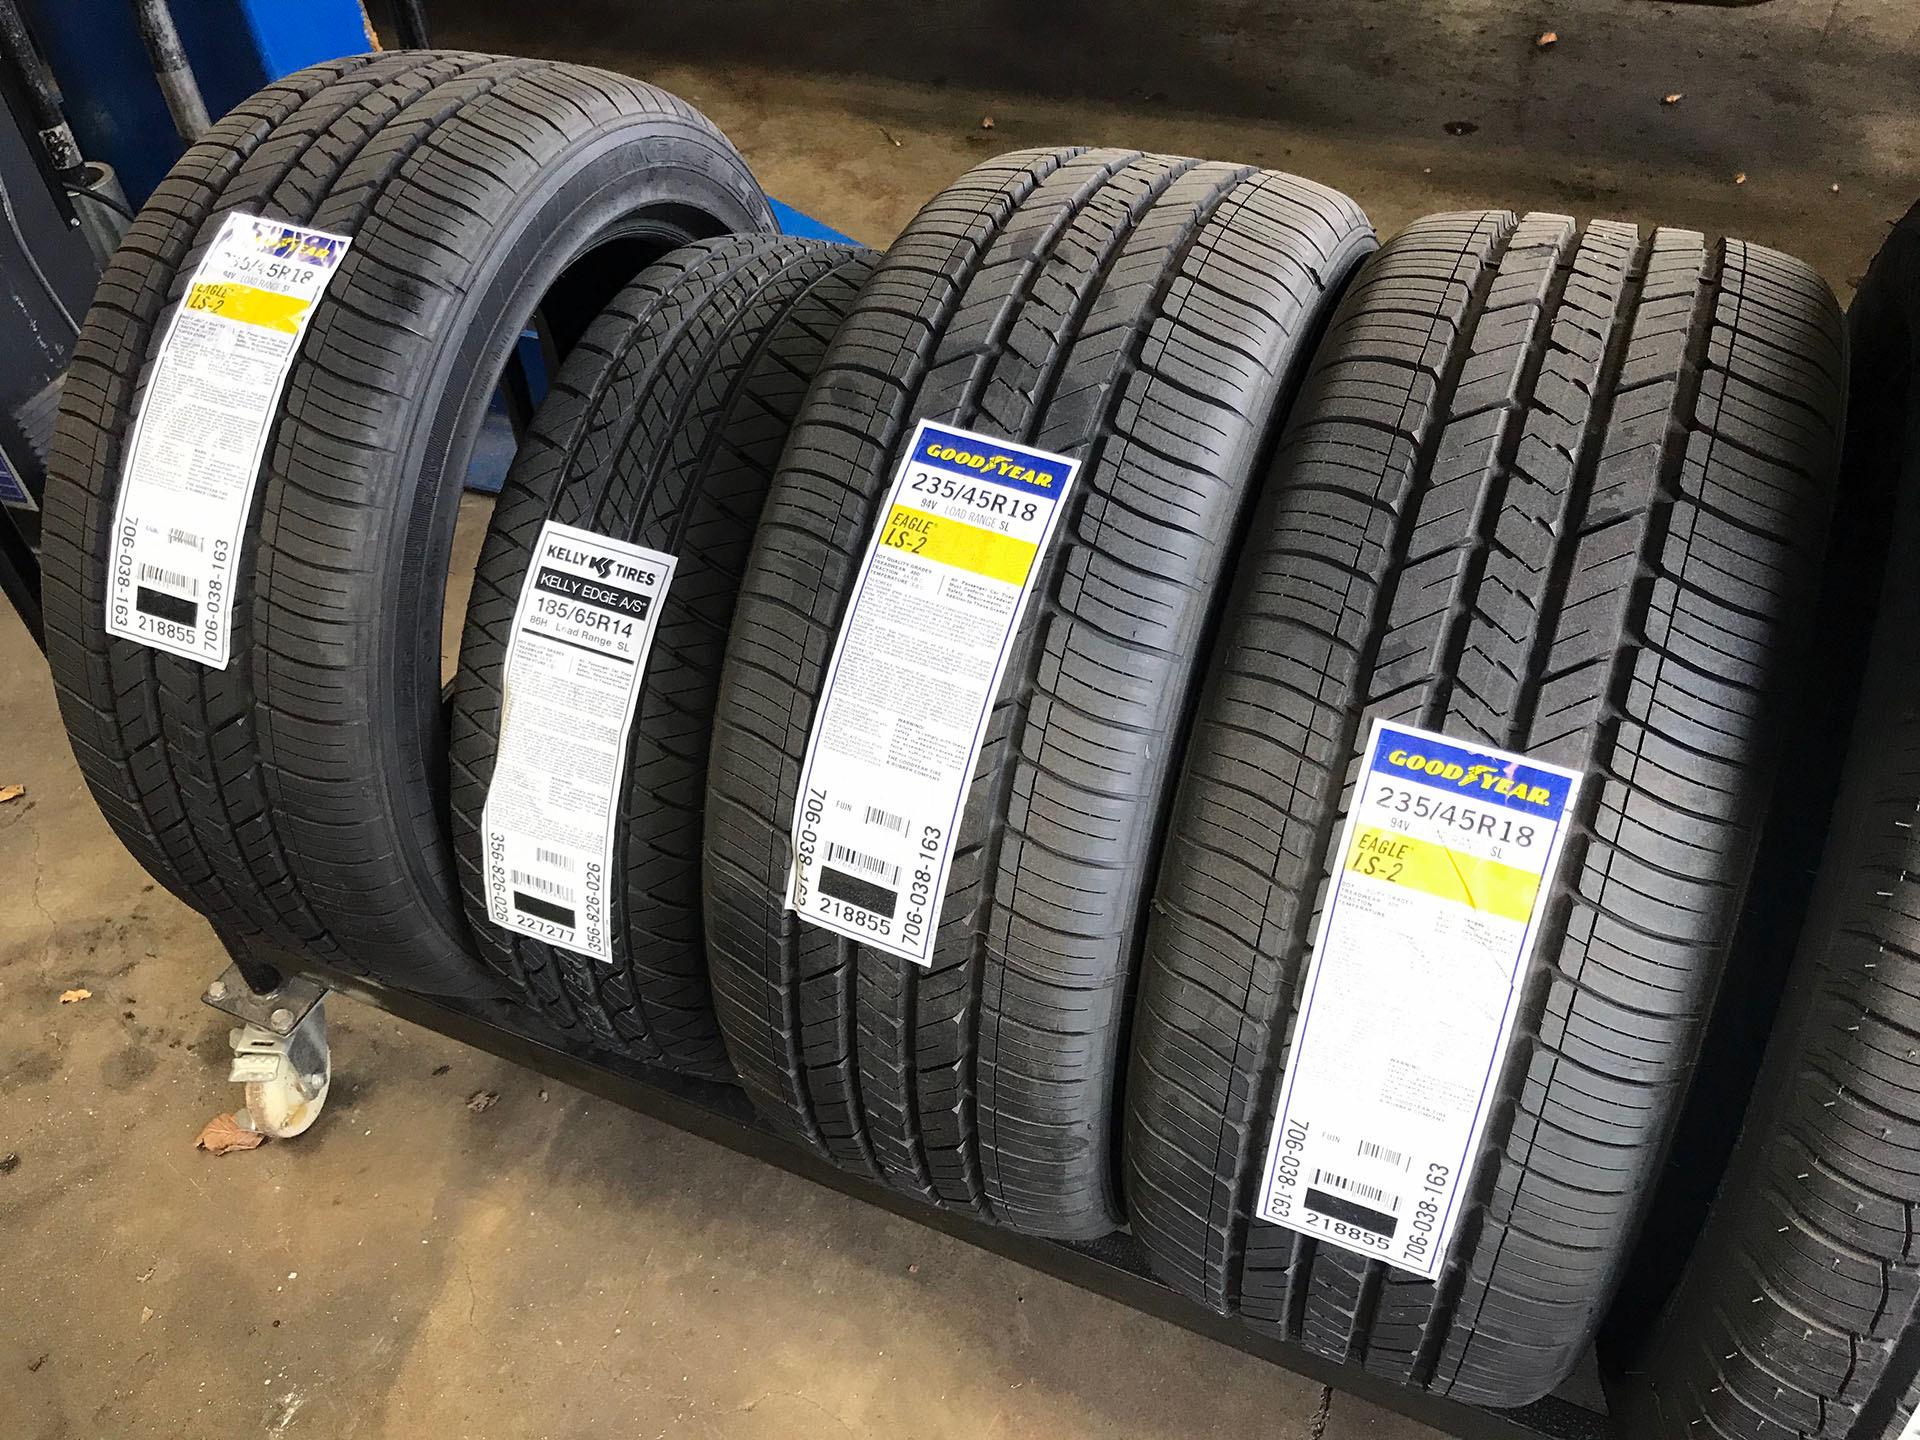 Getting tires at independent repair shops vs. big box stores